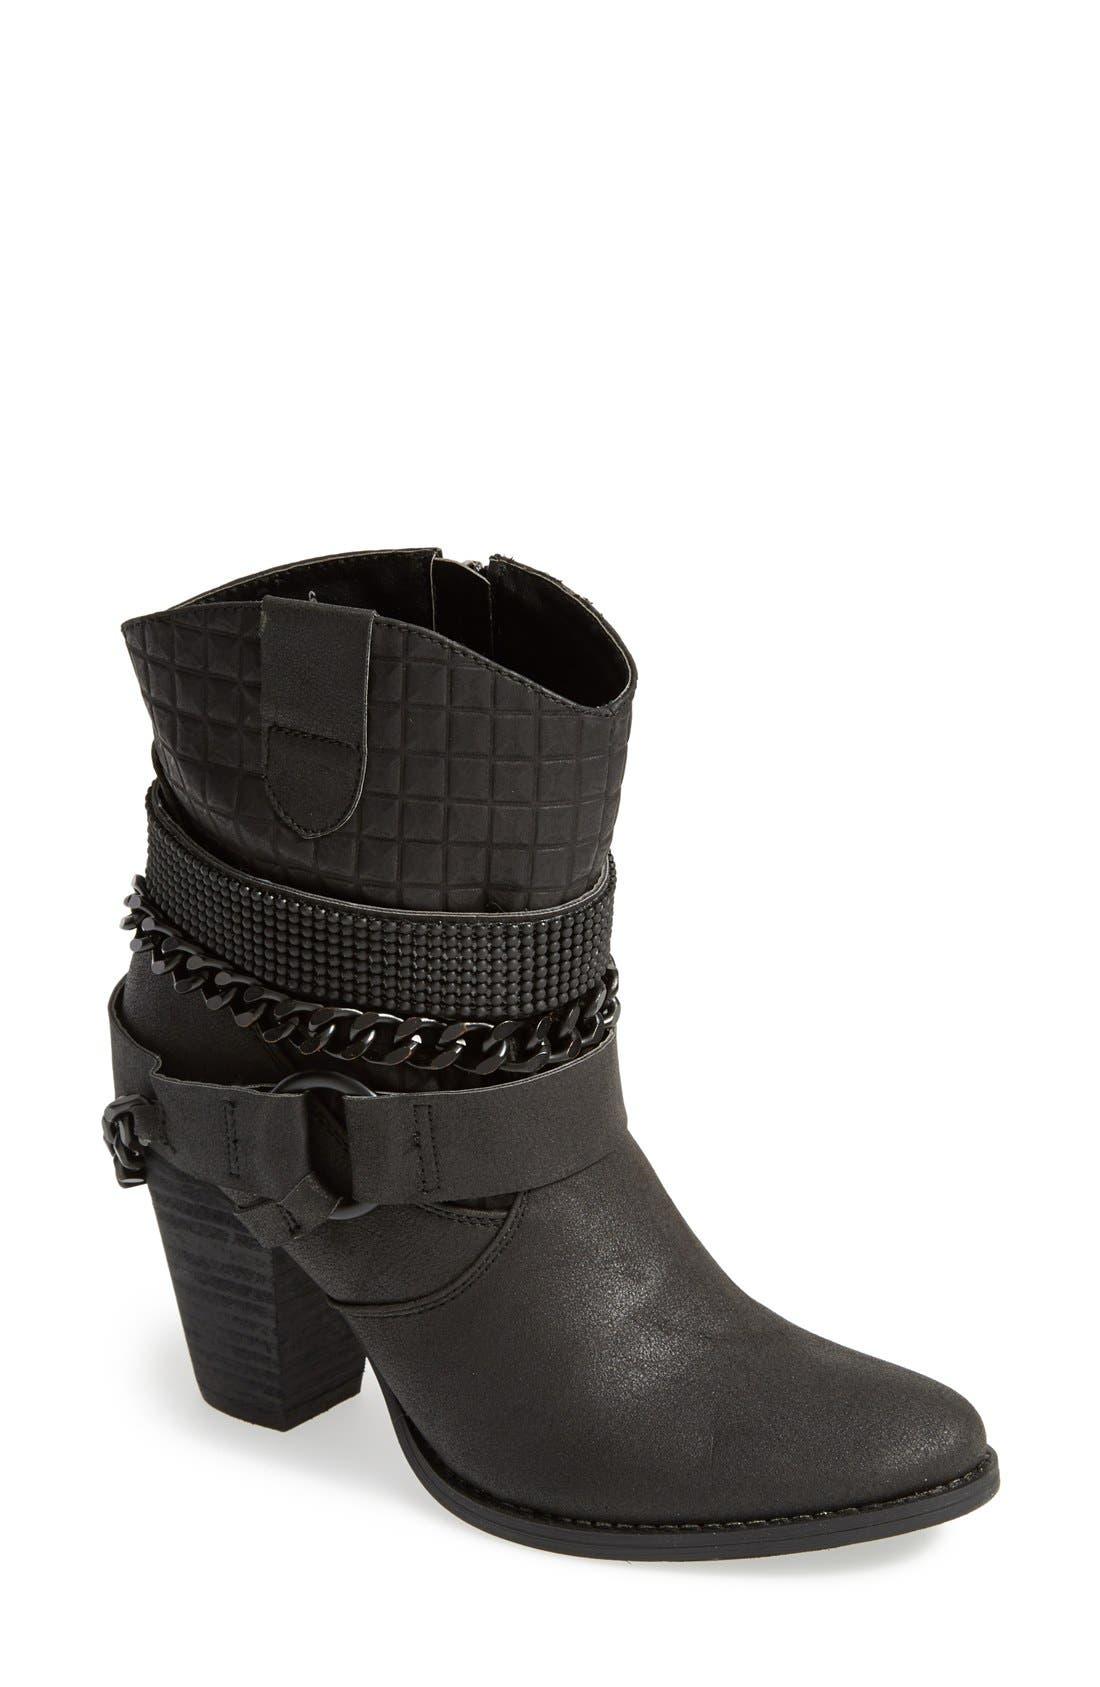 Main Image - Very Volatile 'Amplify' Western Boot (Women)